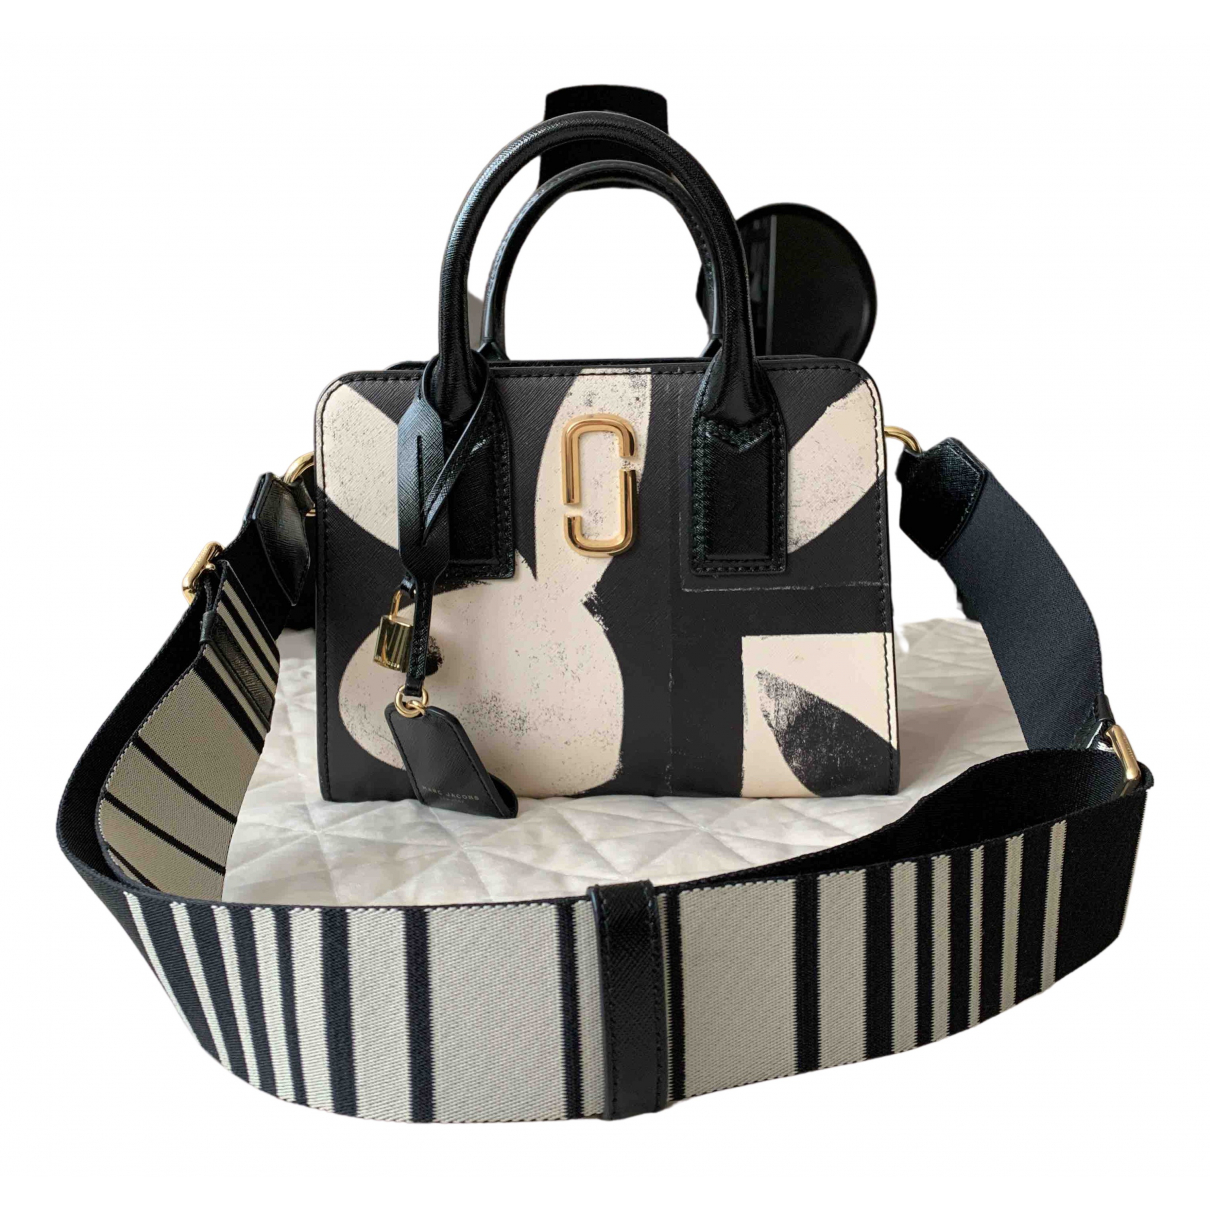 Marc Jacobs N Black handbag for Women N